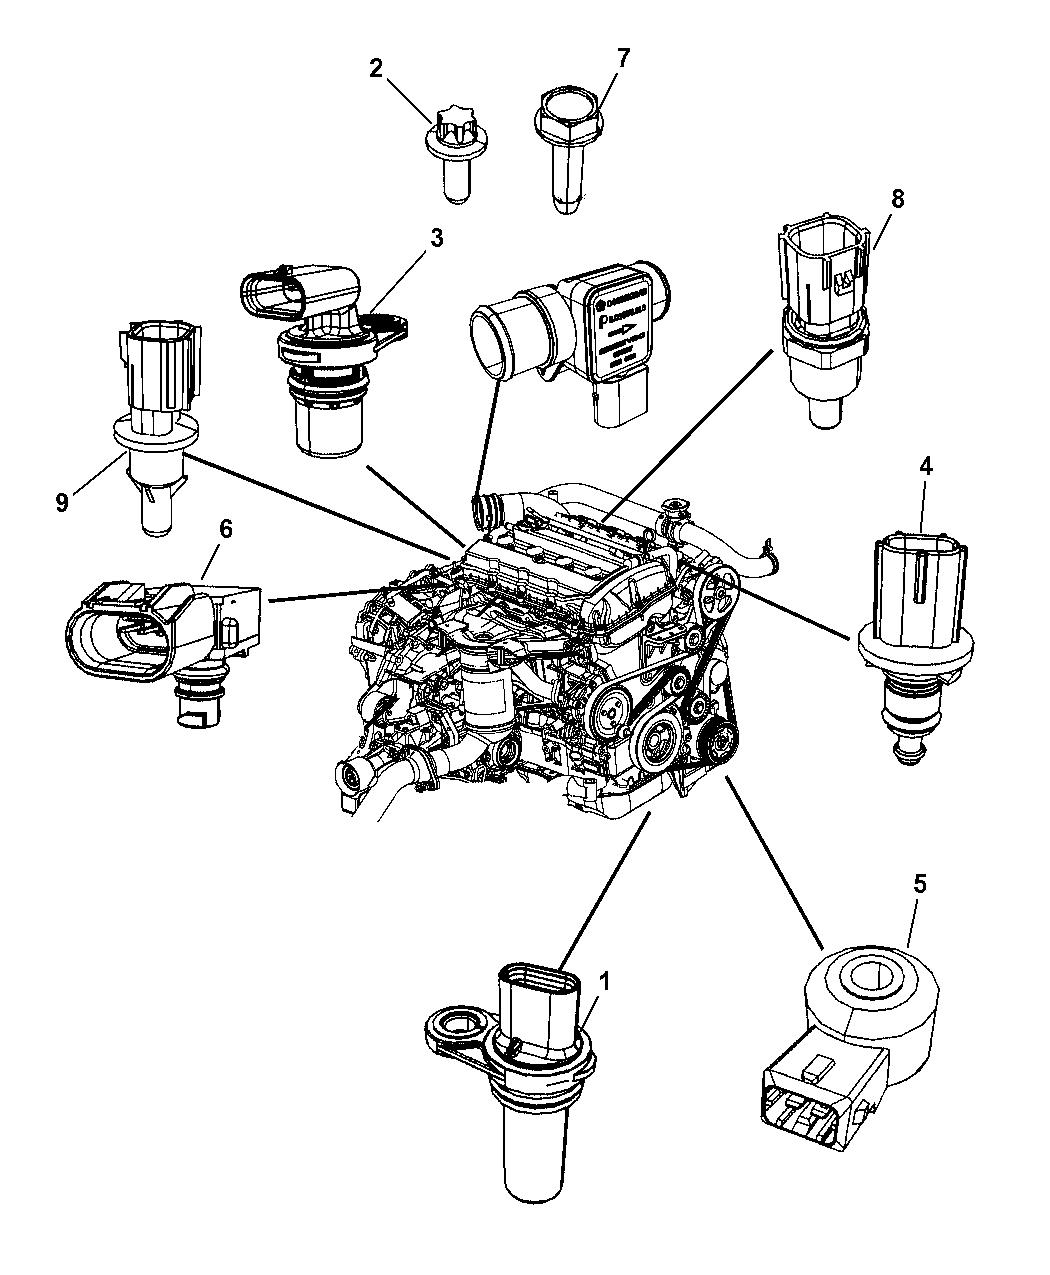 2011 Dodge Journey Engine Diagram • Wiring Diagram For Free